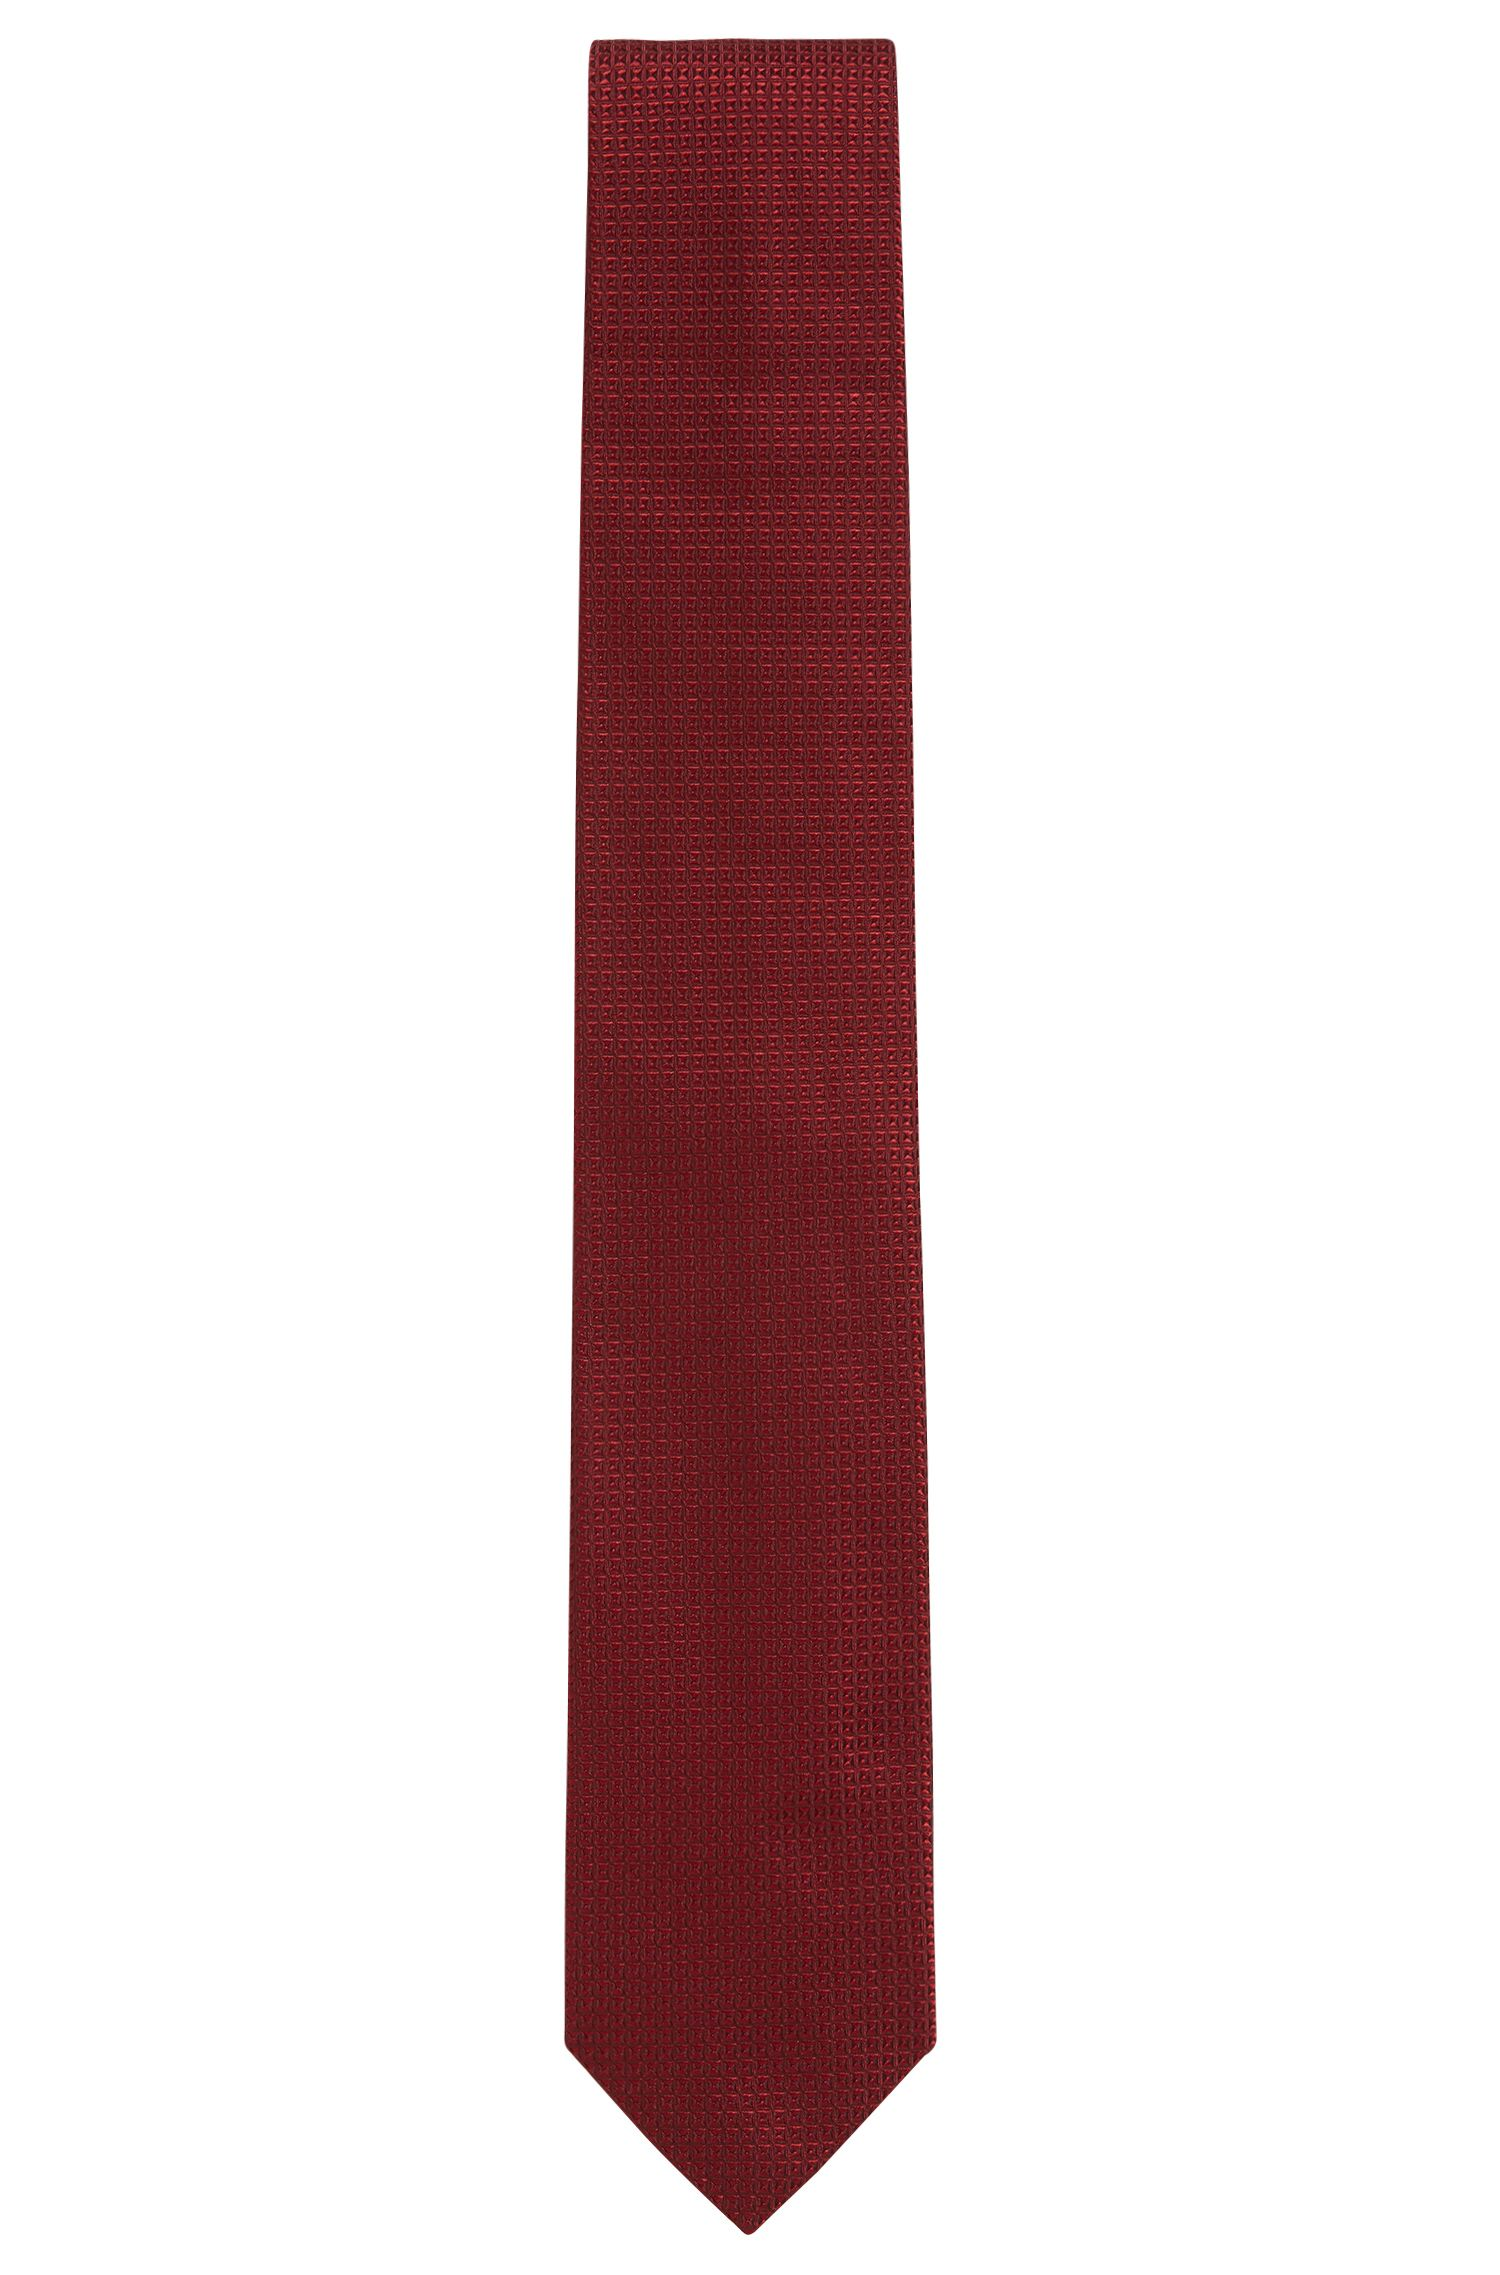 'Tie 7 cm' | Regular, Microdiamond Italian Silk Tie